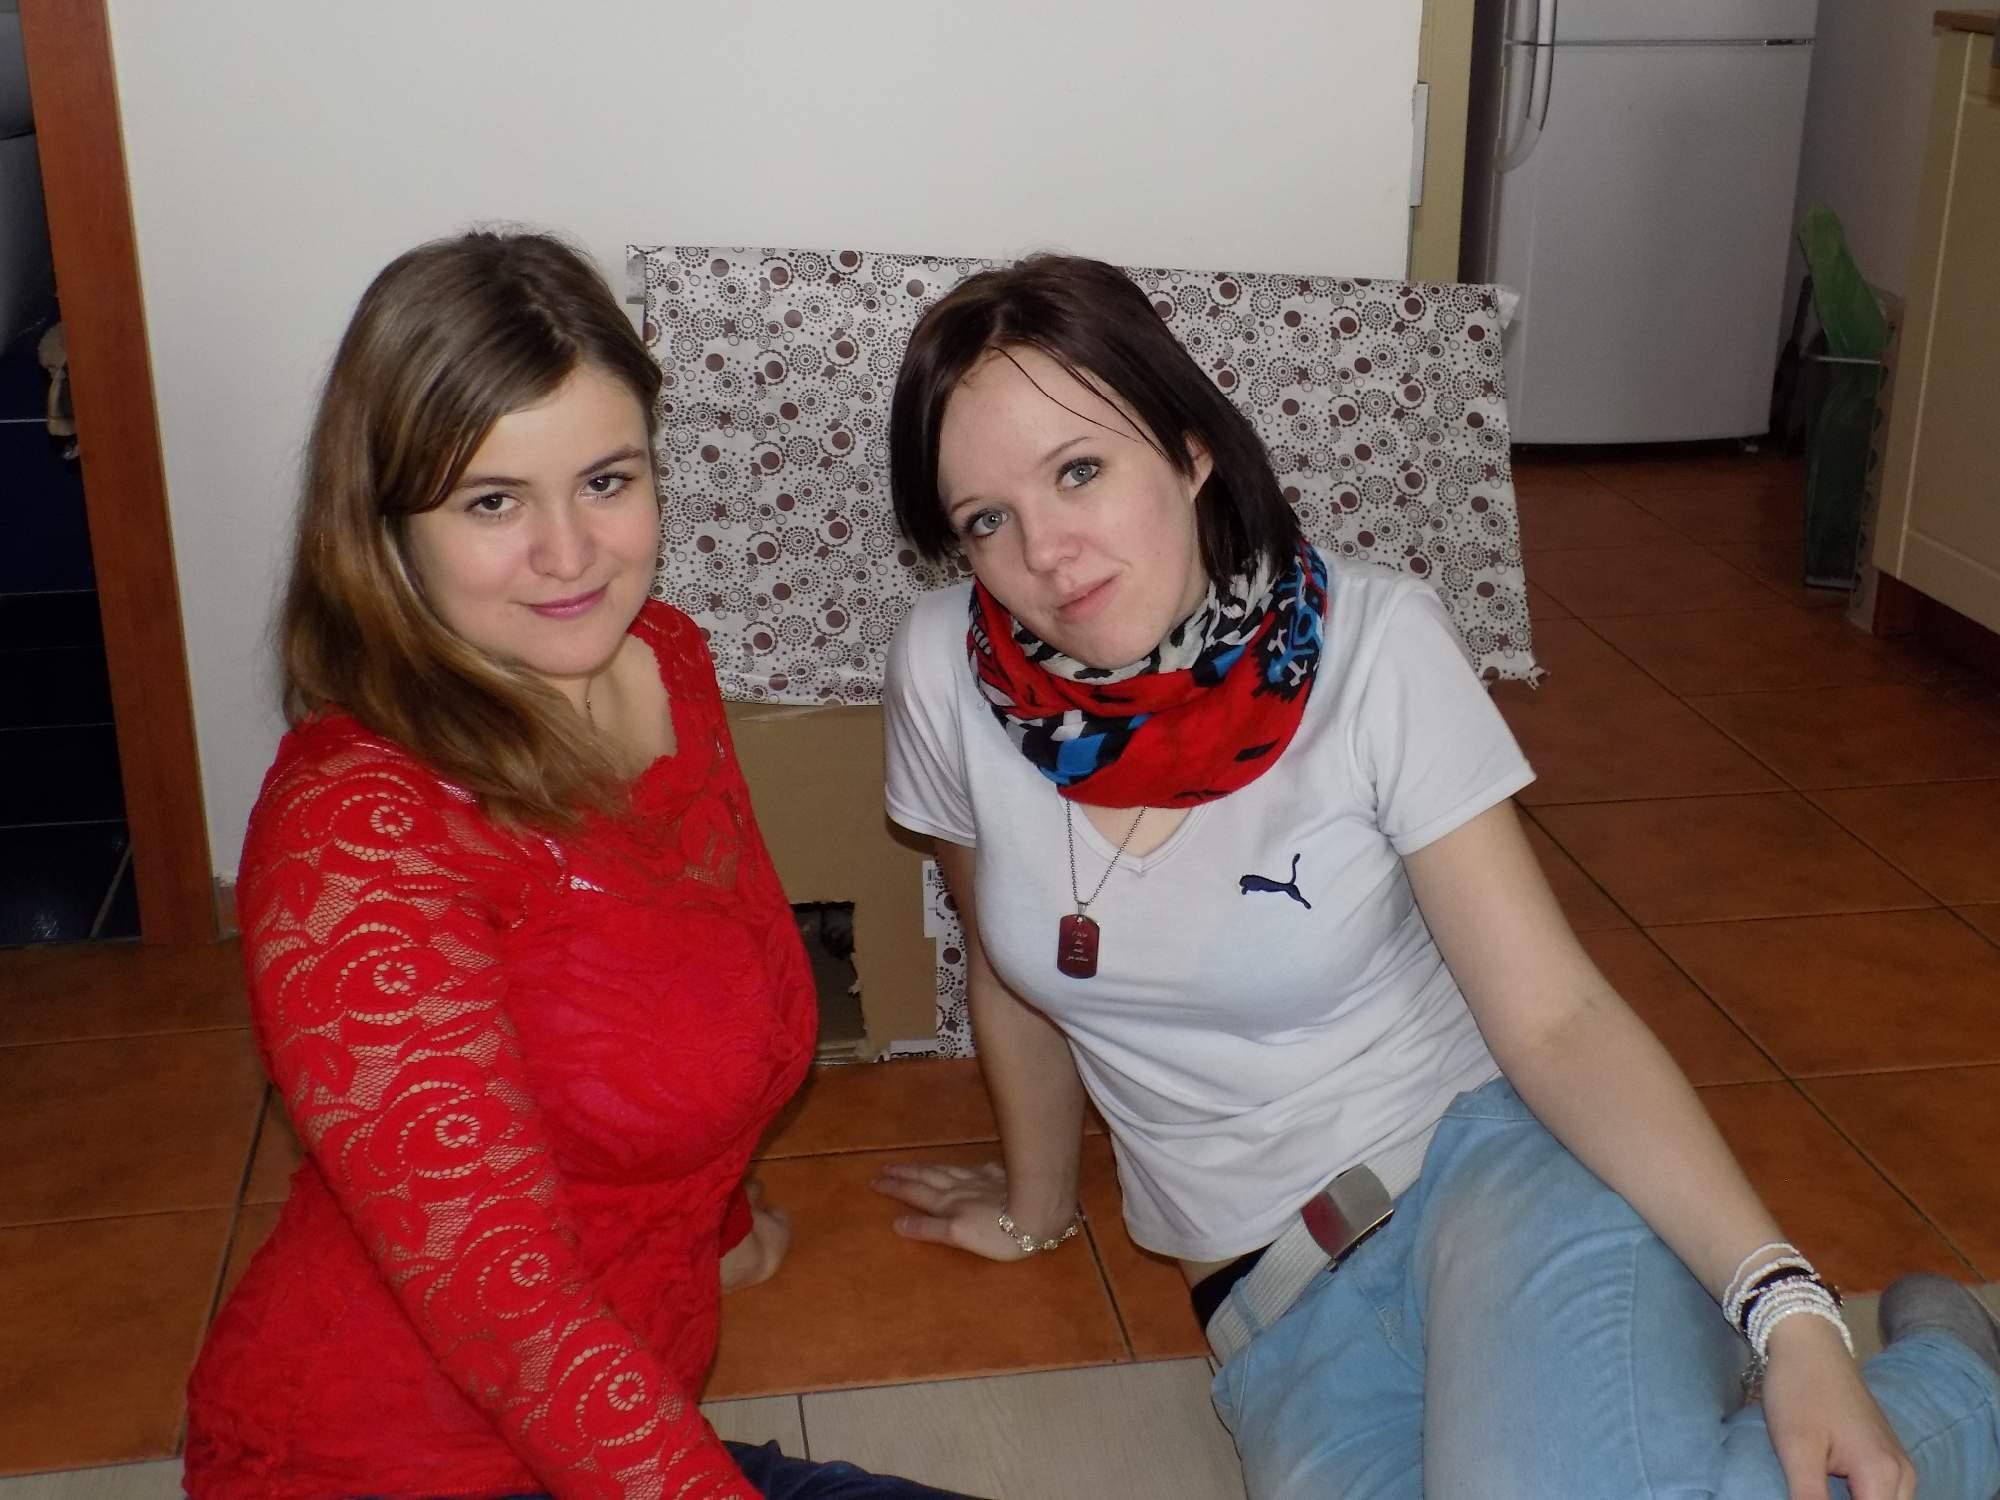 http://img25.rajce.idnes.cz/d2502/13/13862/13862137_c5559384bb63a400f5d8327efbaafba8/images/DSCN1504.jpg